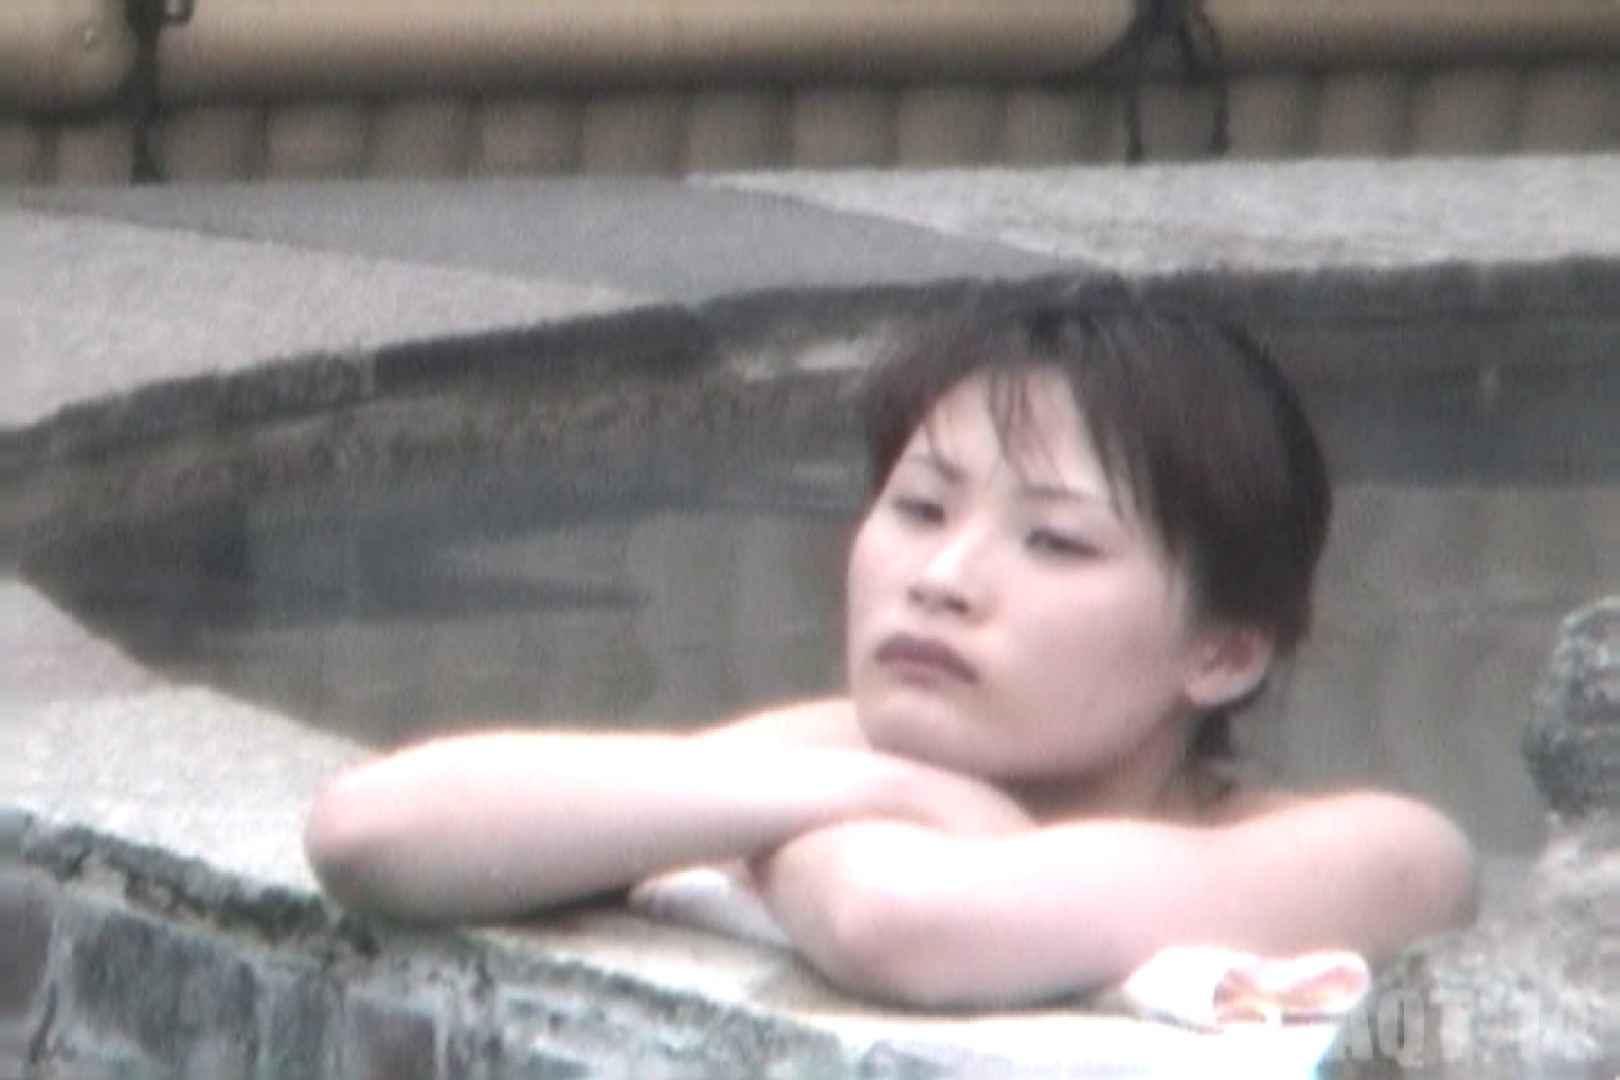 Aquaな露天風呂Vol.822 露天 すけべAV動画紹介 98連発 35